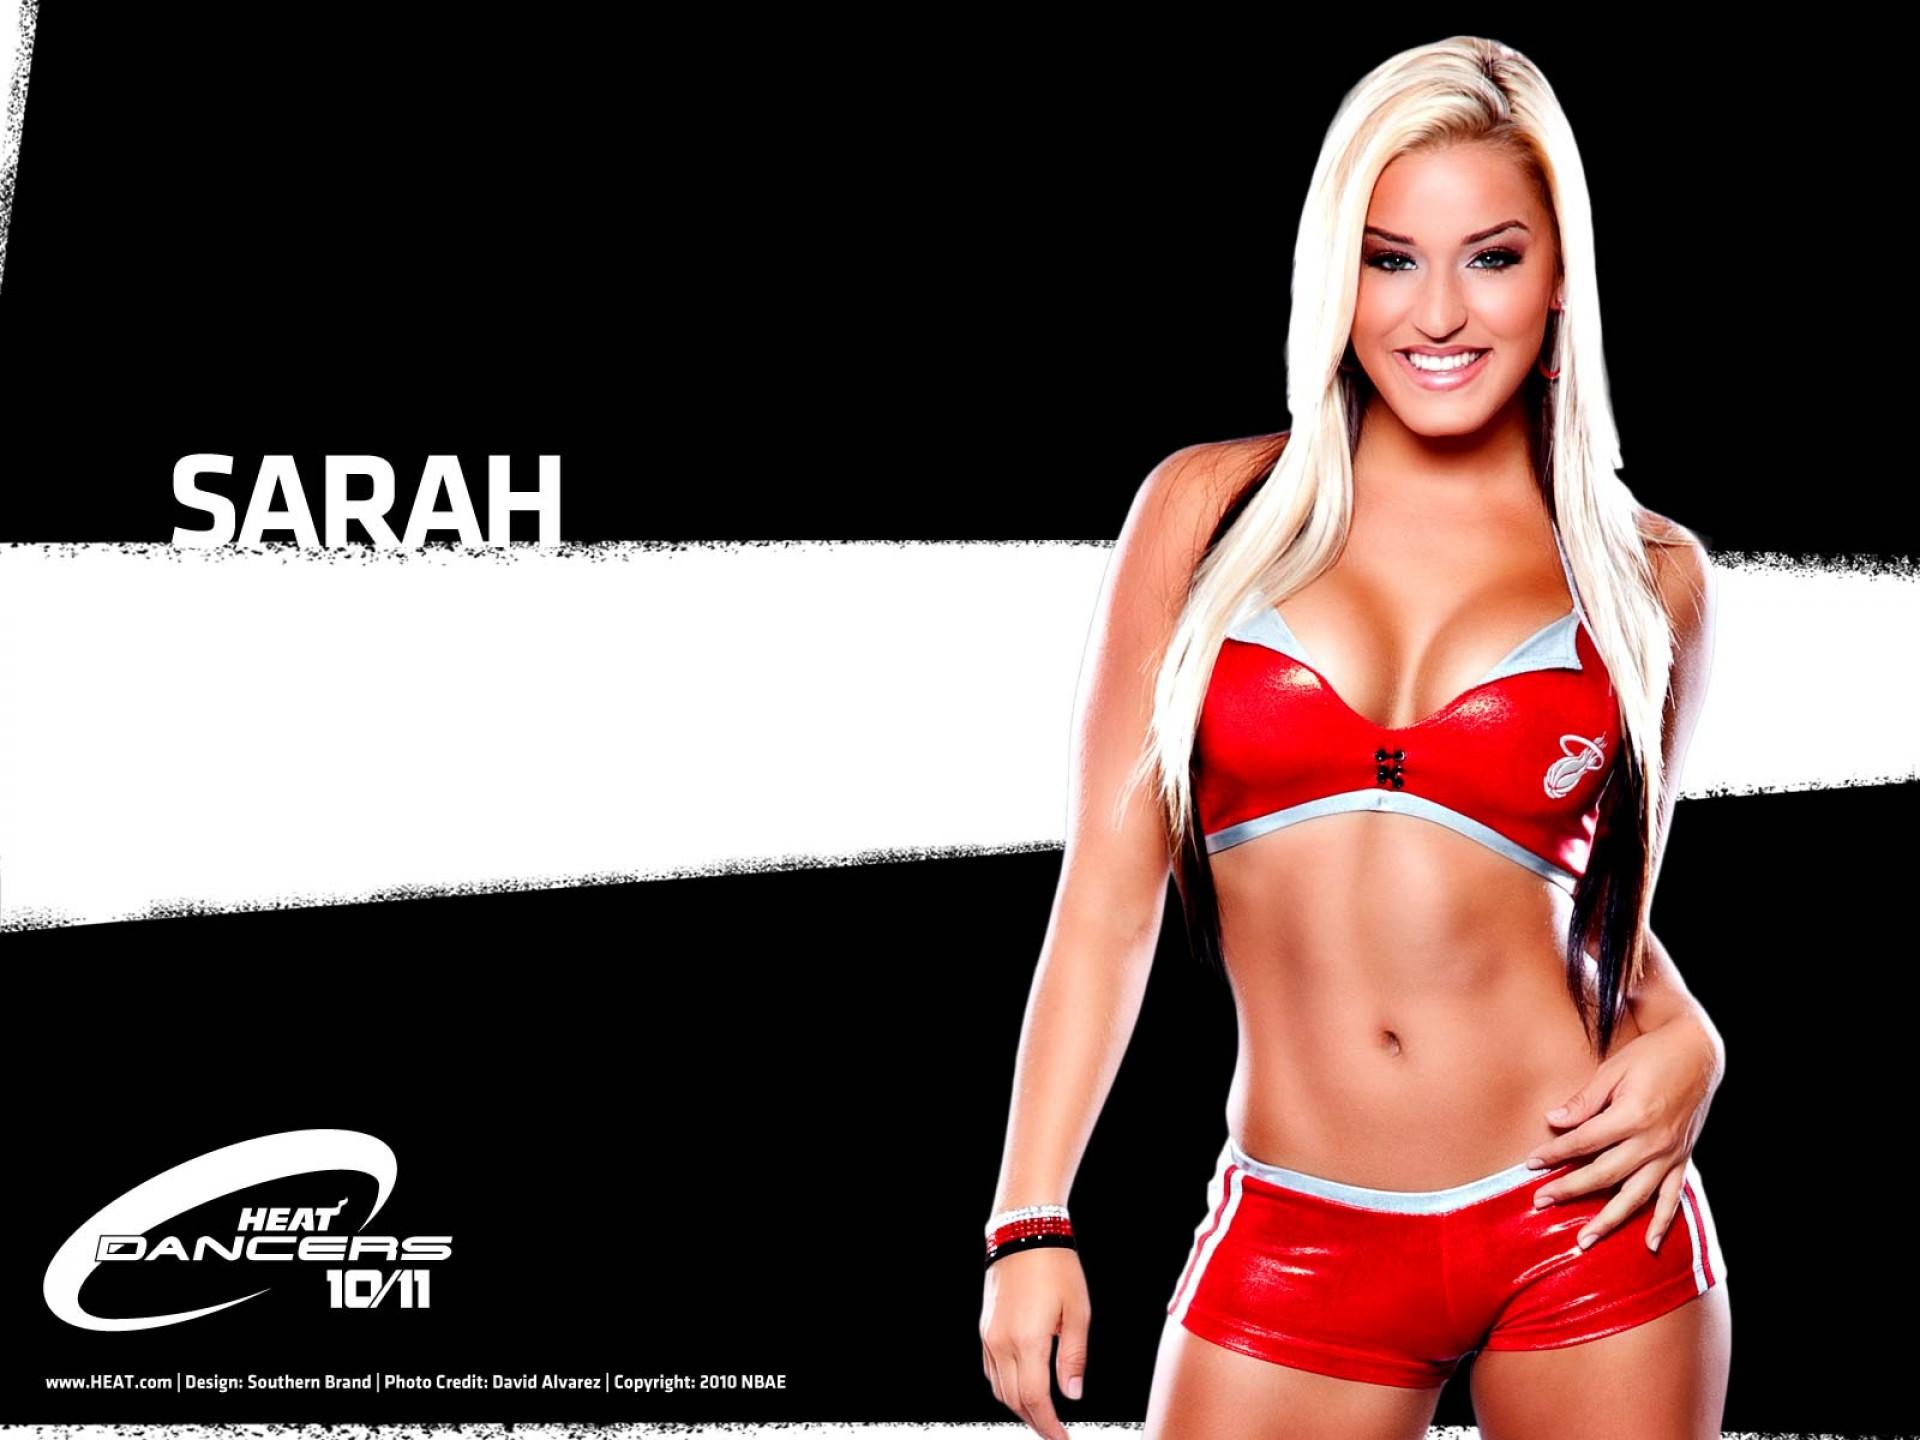 Miami Heat Nba Dancers Sarah United States Usa Pictures HD Wallpaper